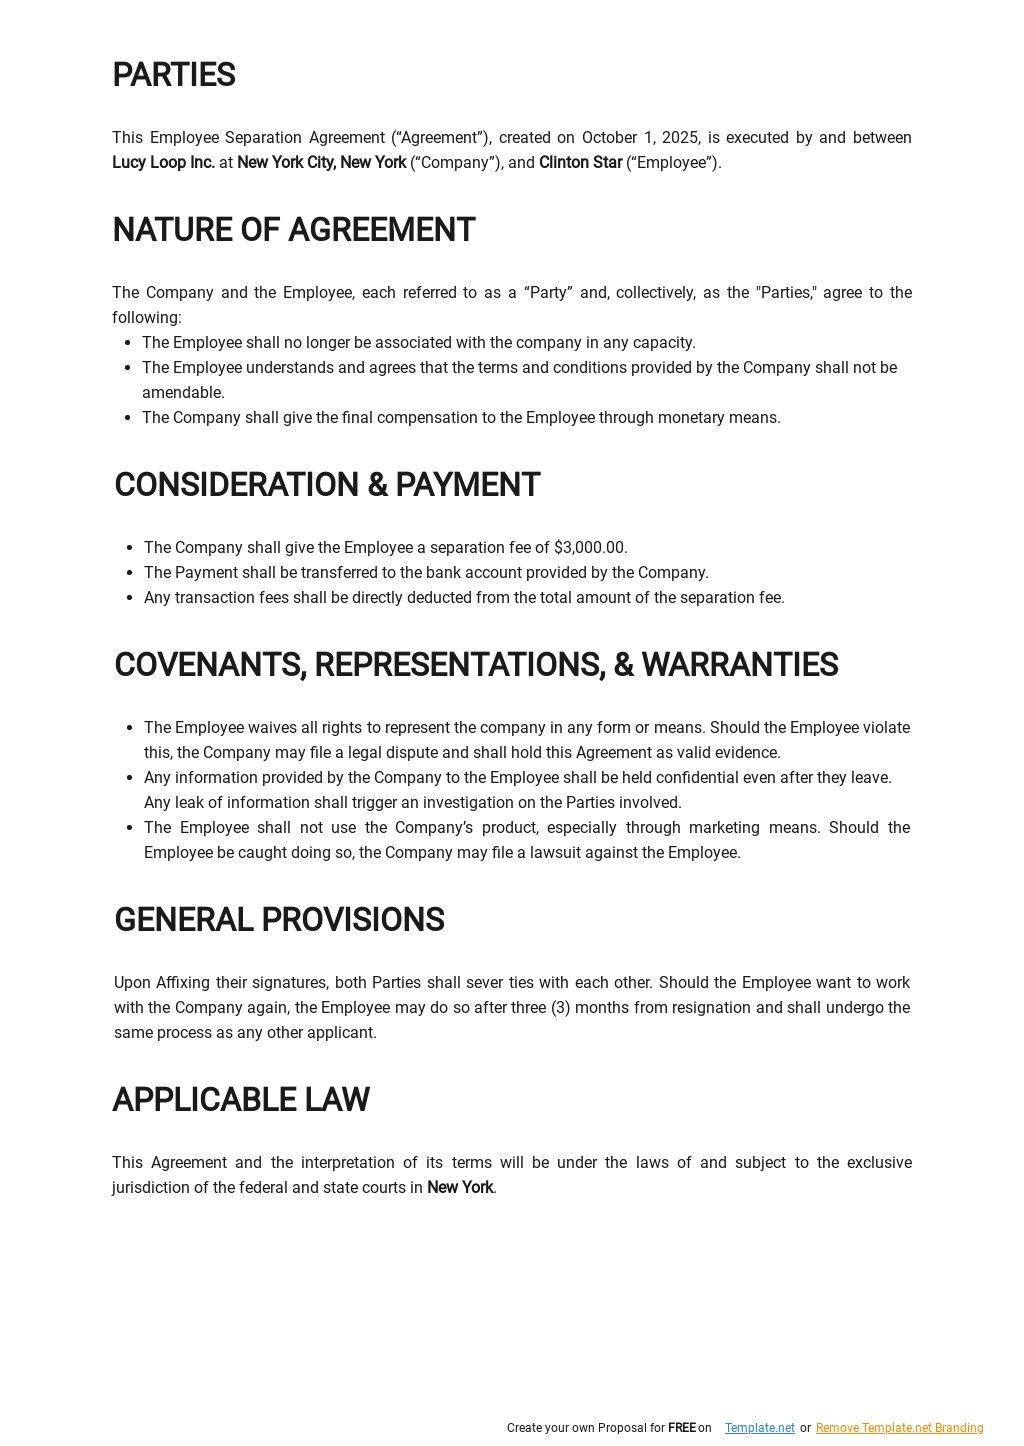 Sample Employee Separation Agreement Template 1.jpe